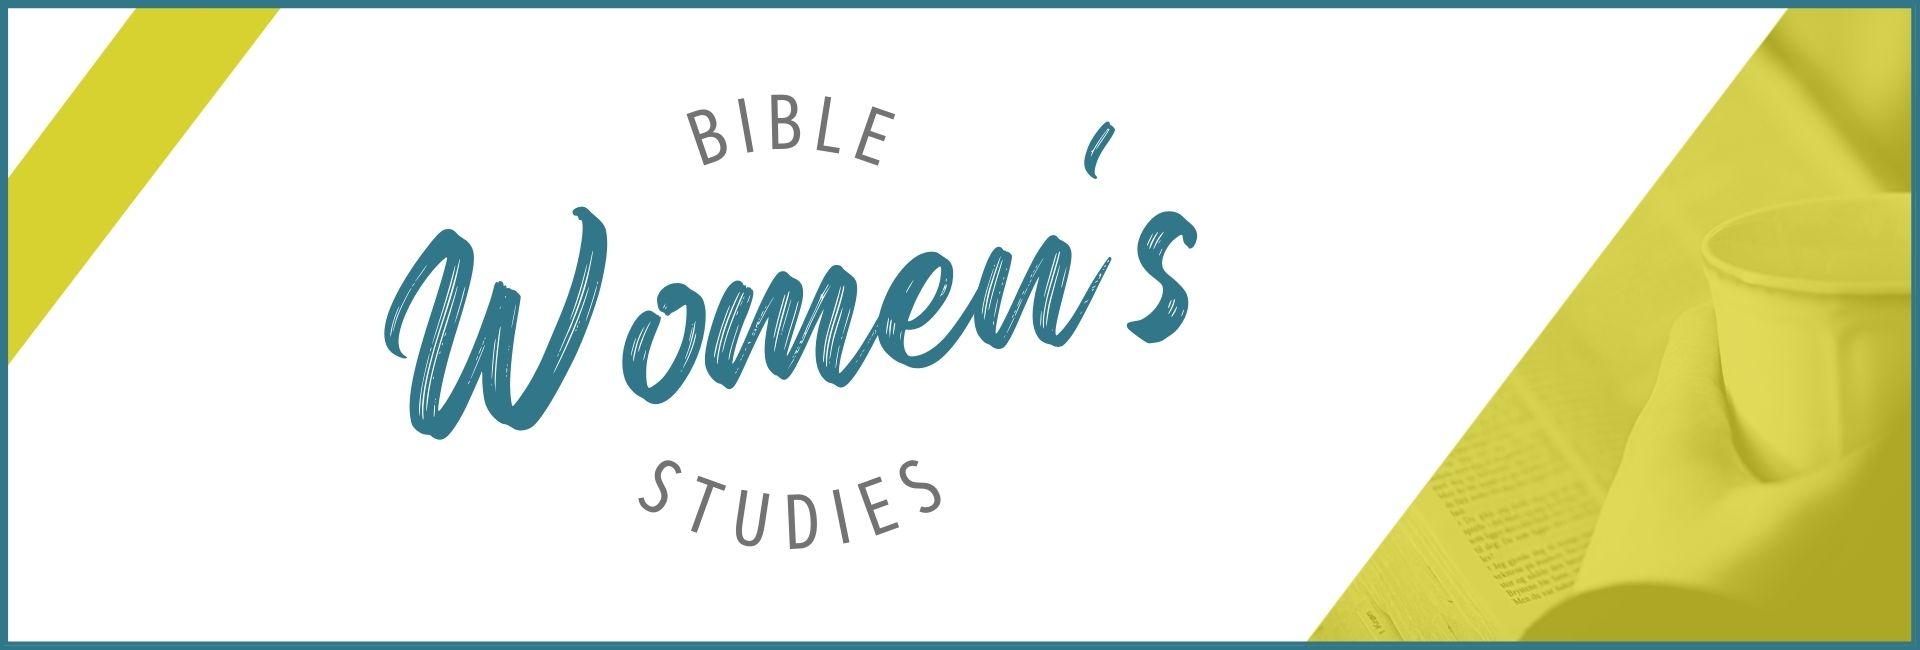 Women's Bible Study F21 Web